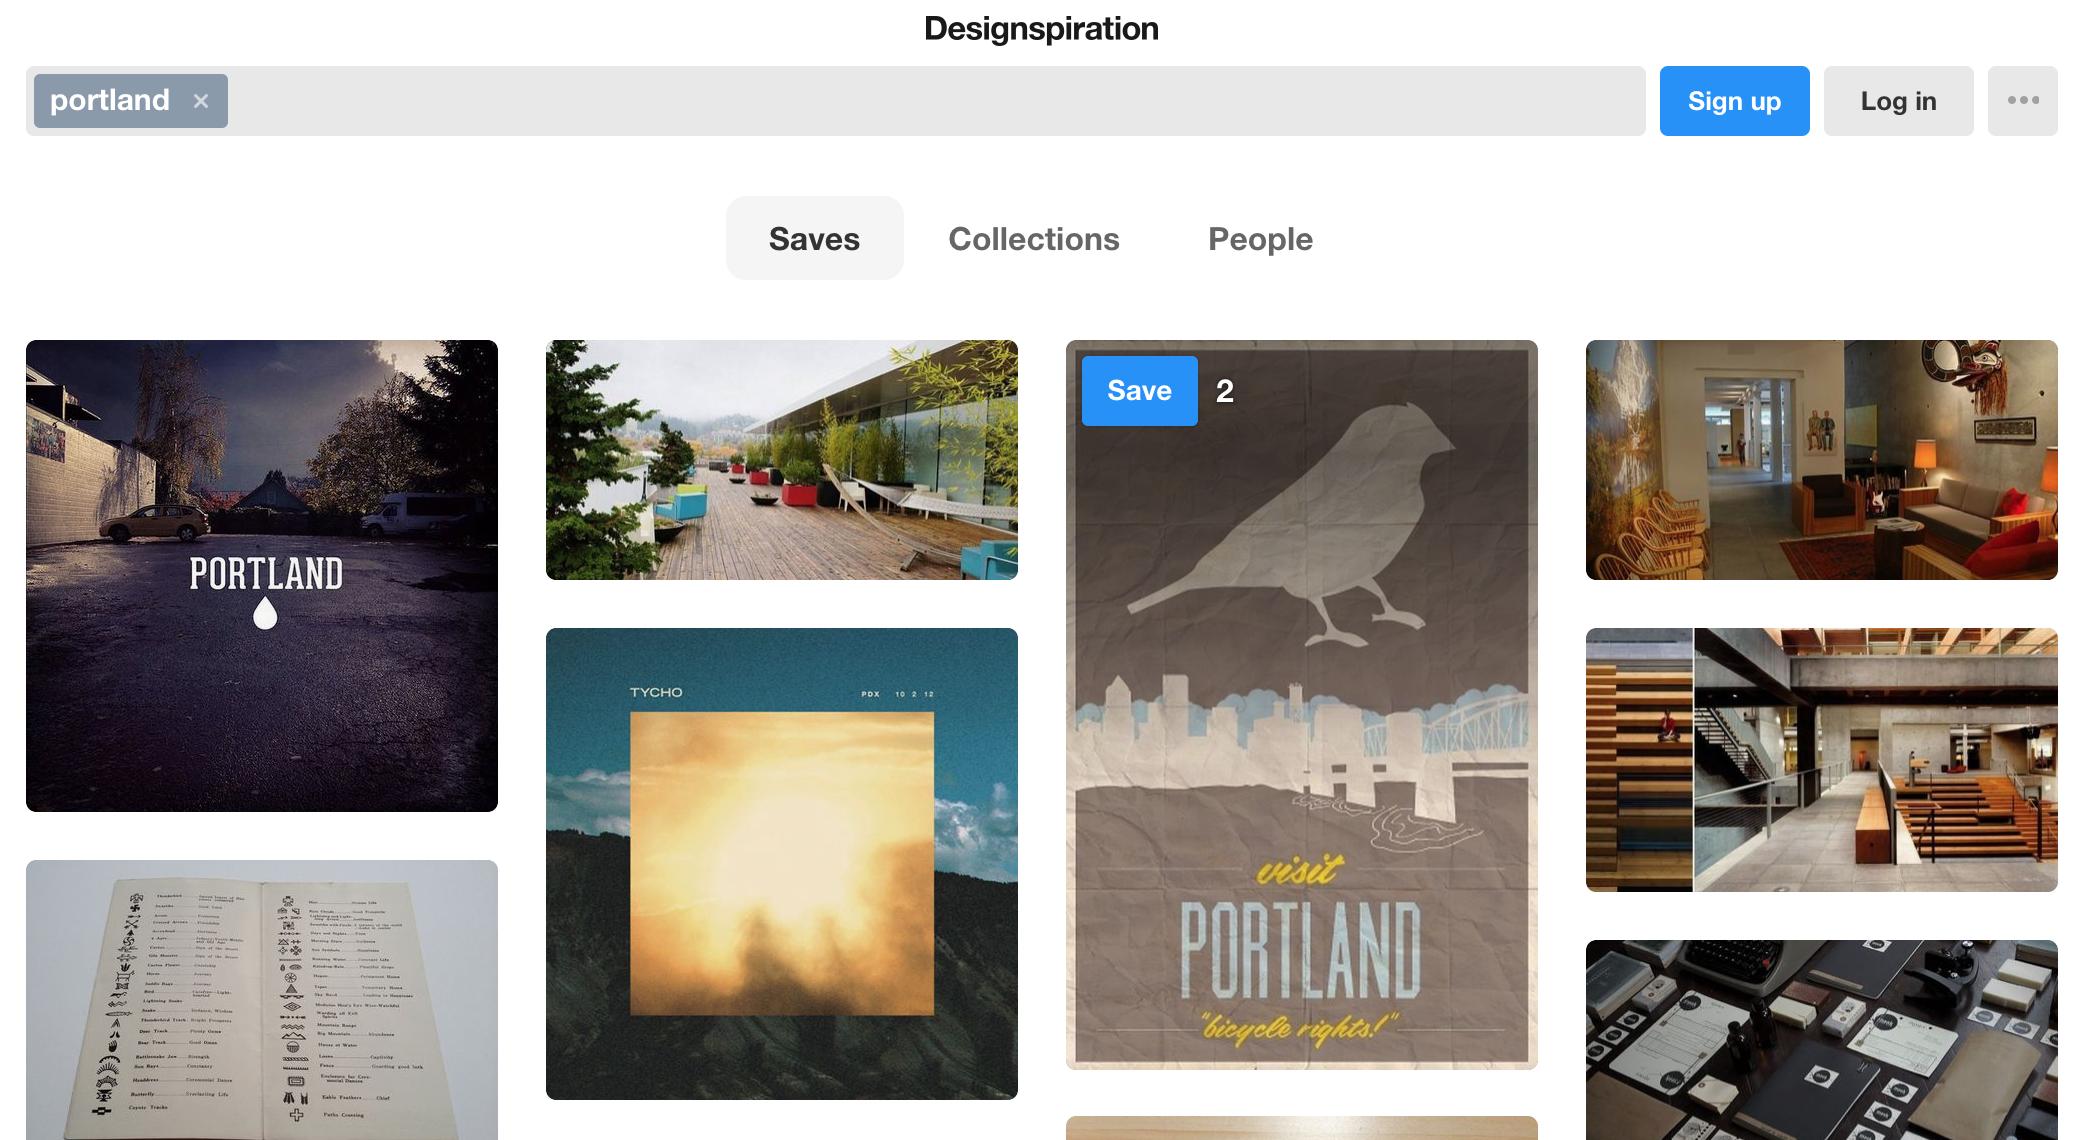 designspiration content marketing